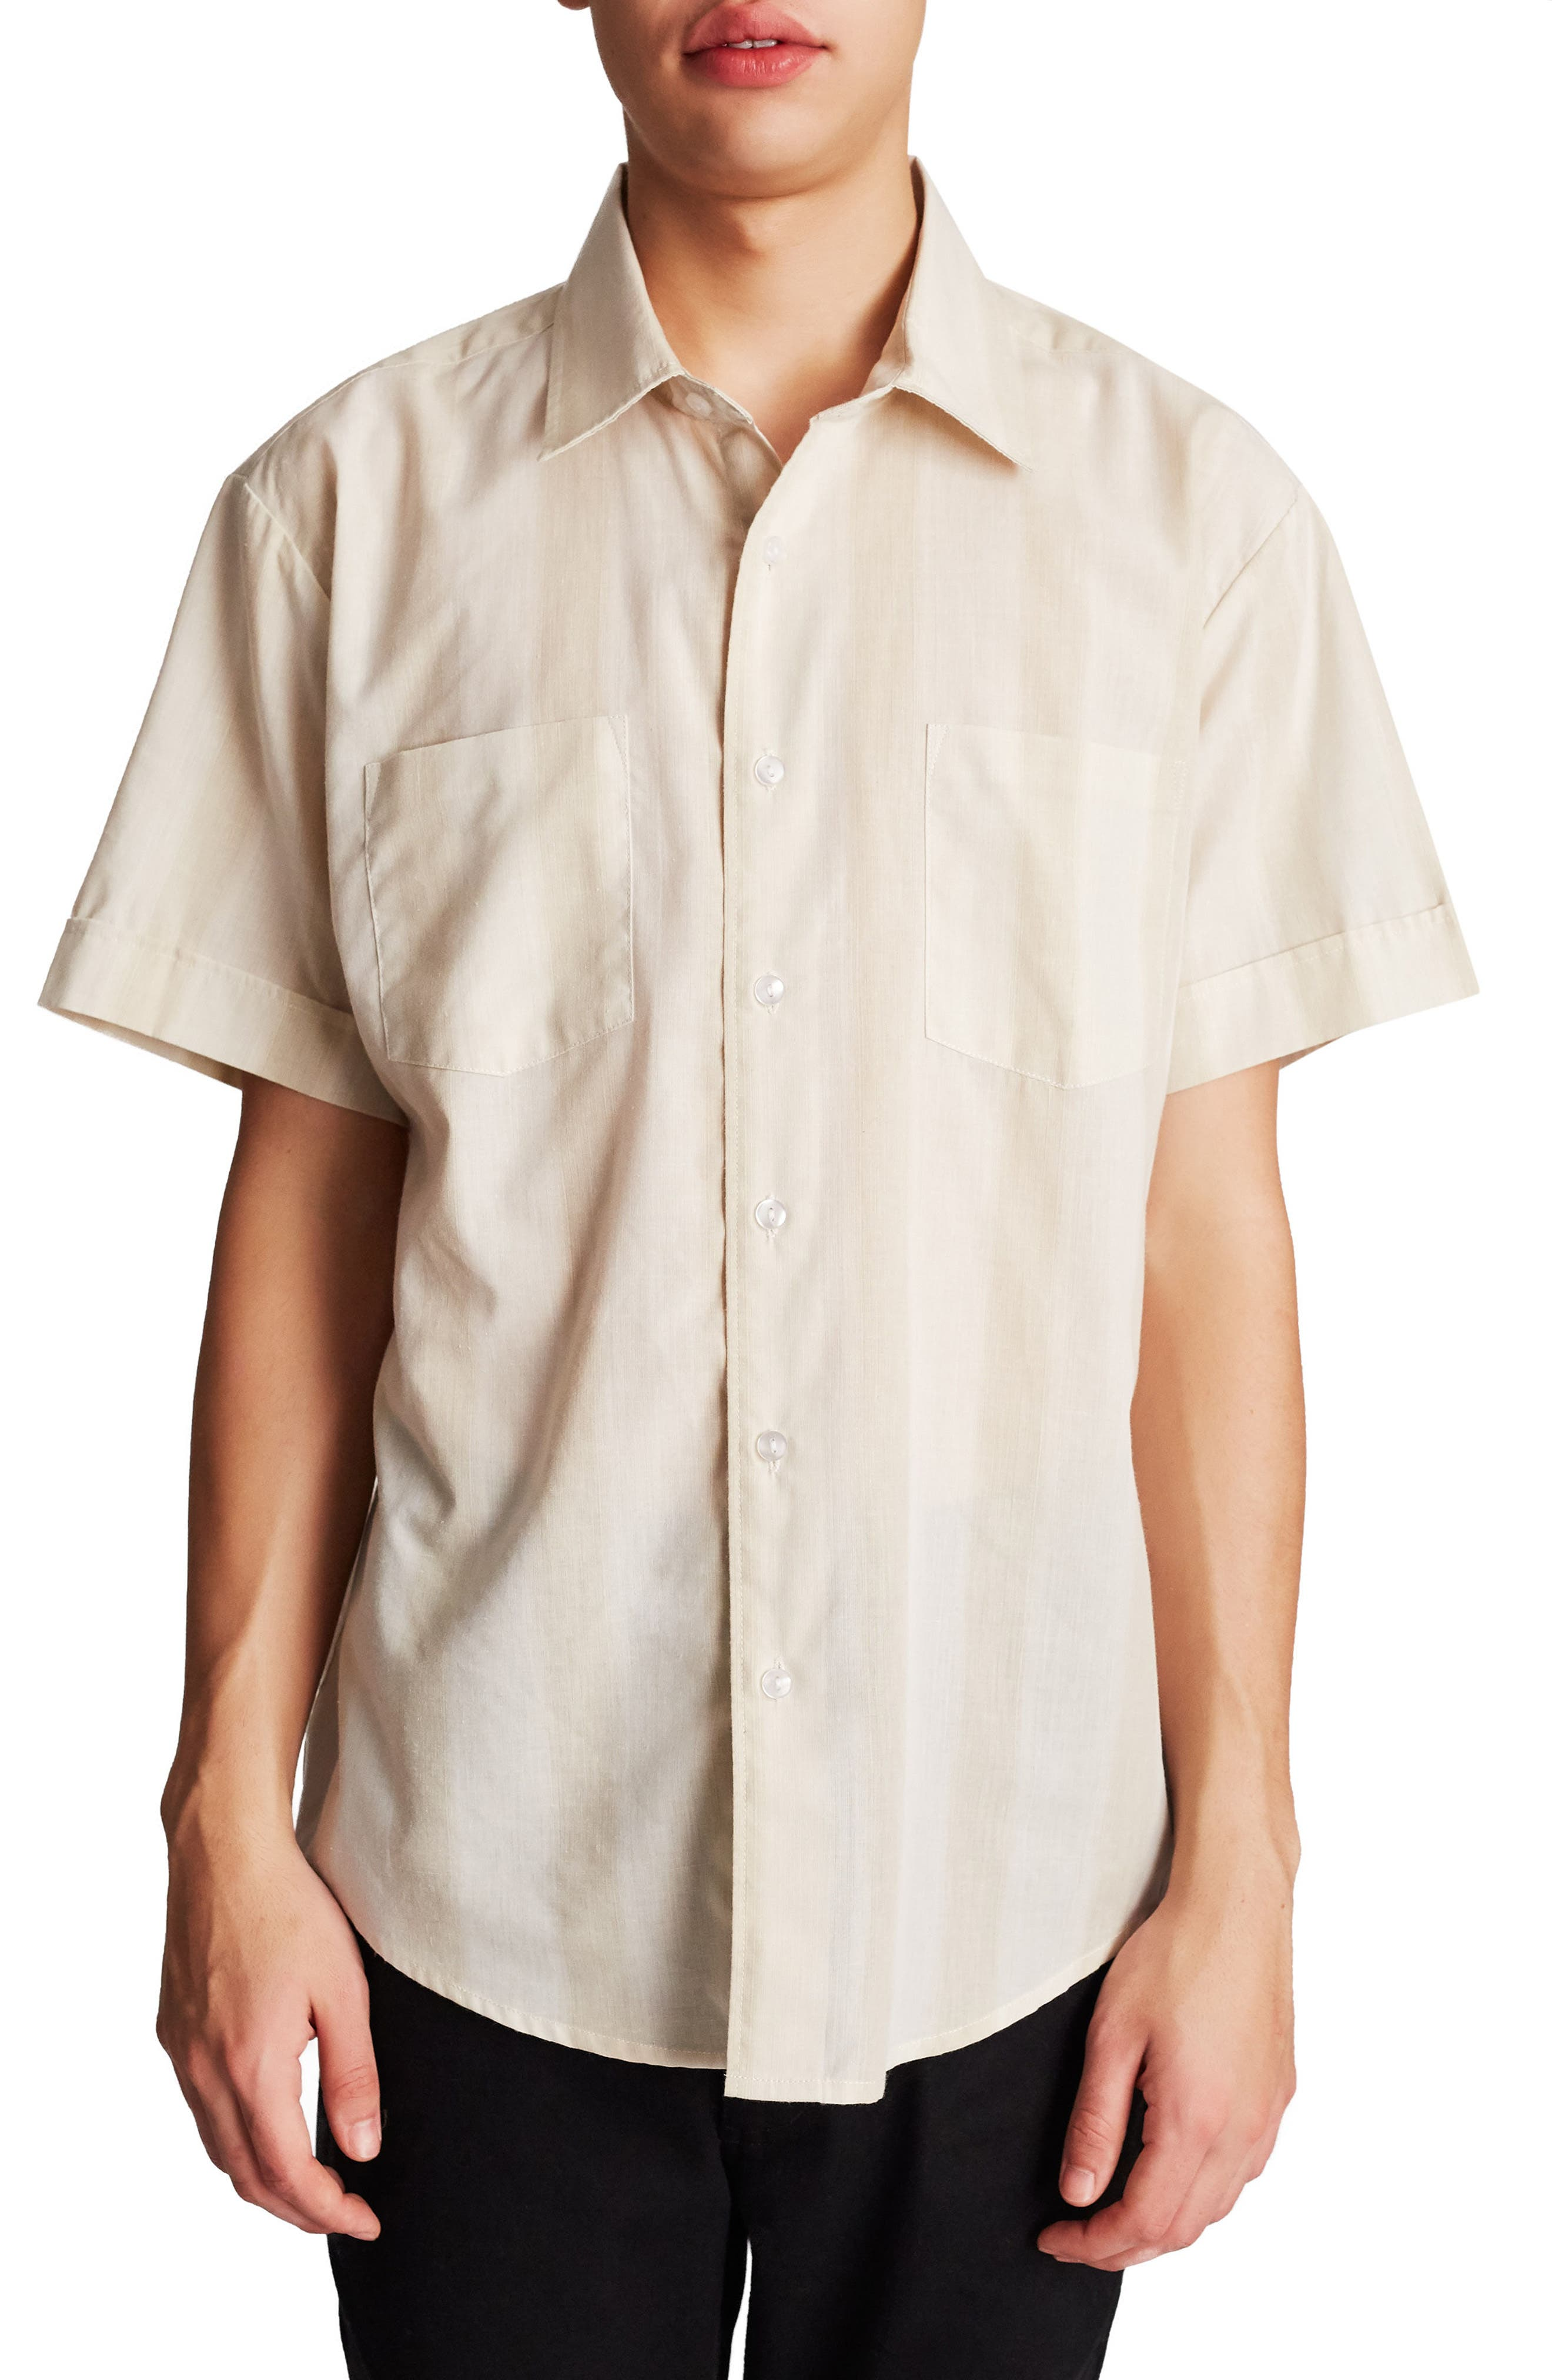 Branson Woven Shirt,                             Main thumbnail 1, color,                             Grey/ Mint